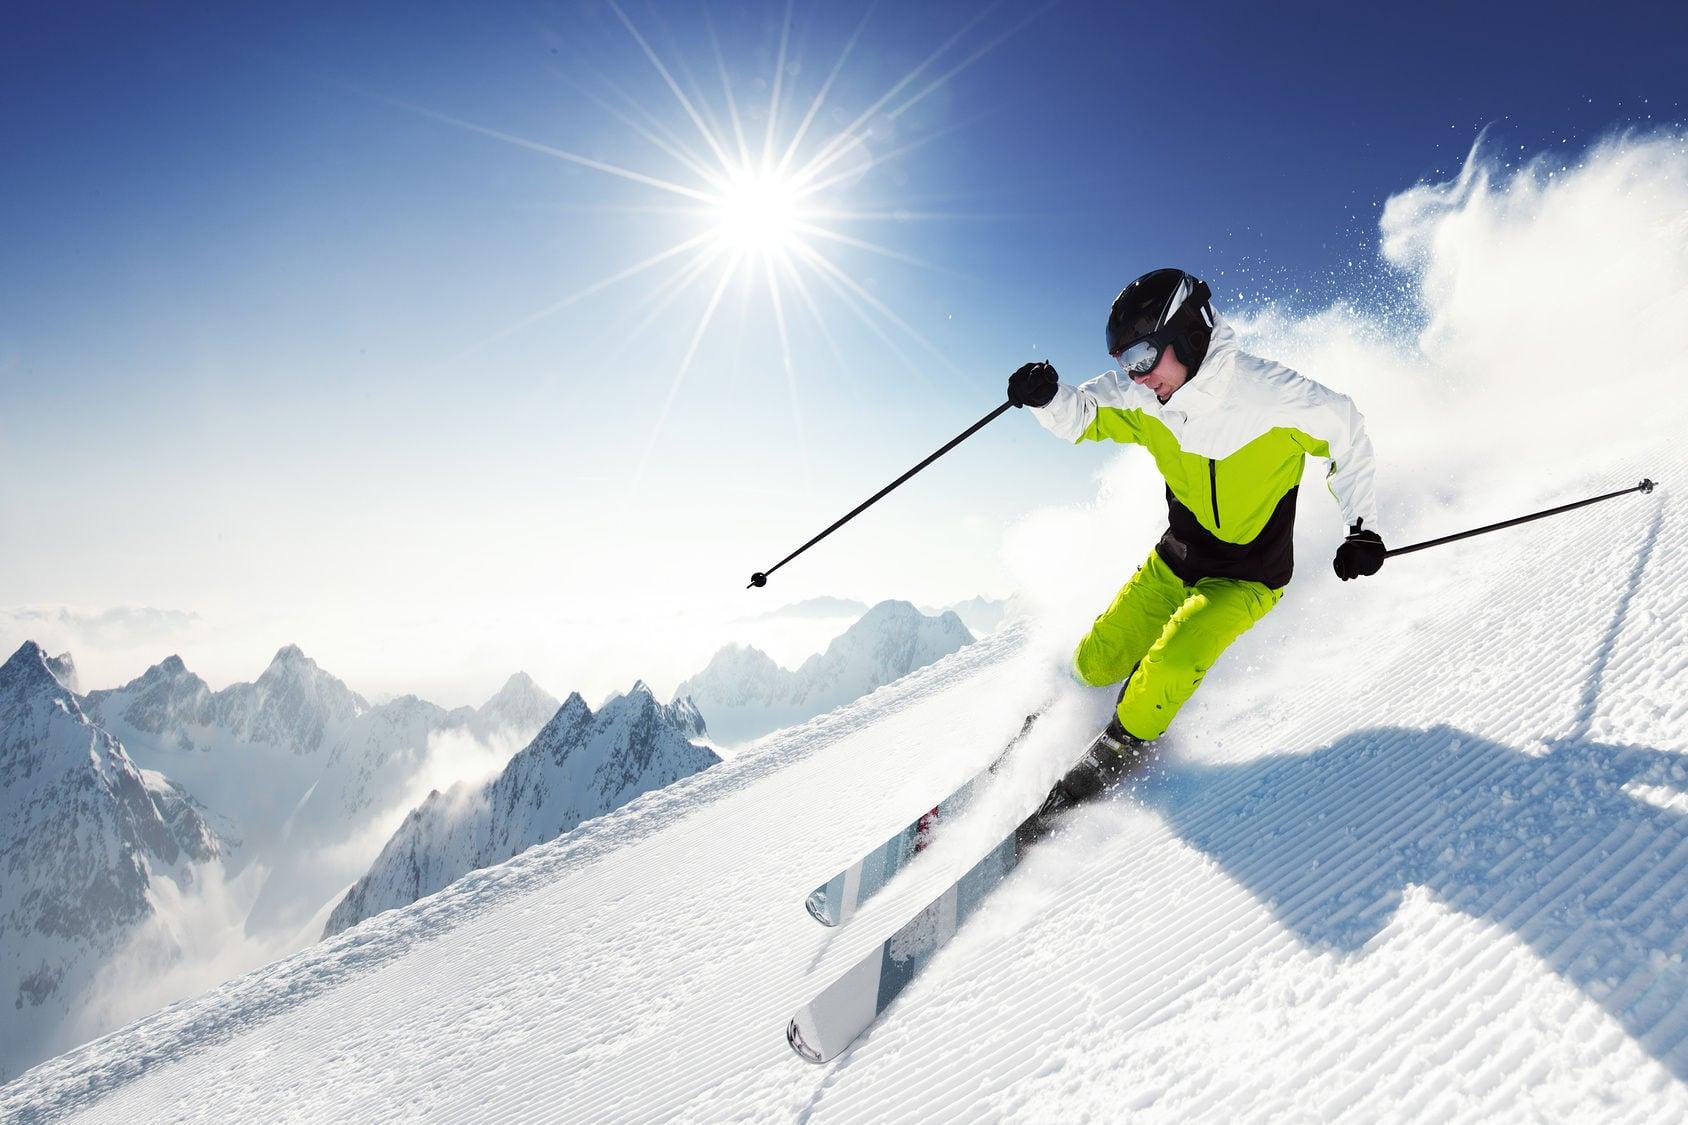 World Cup alpine skiing